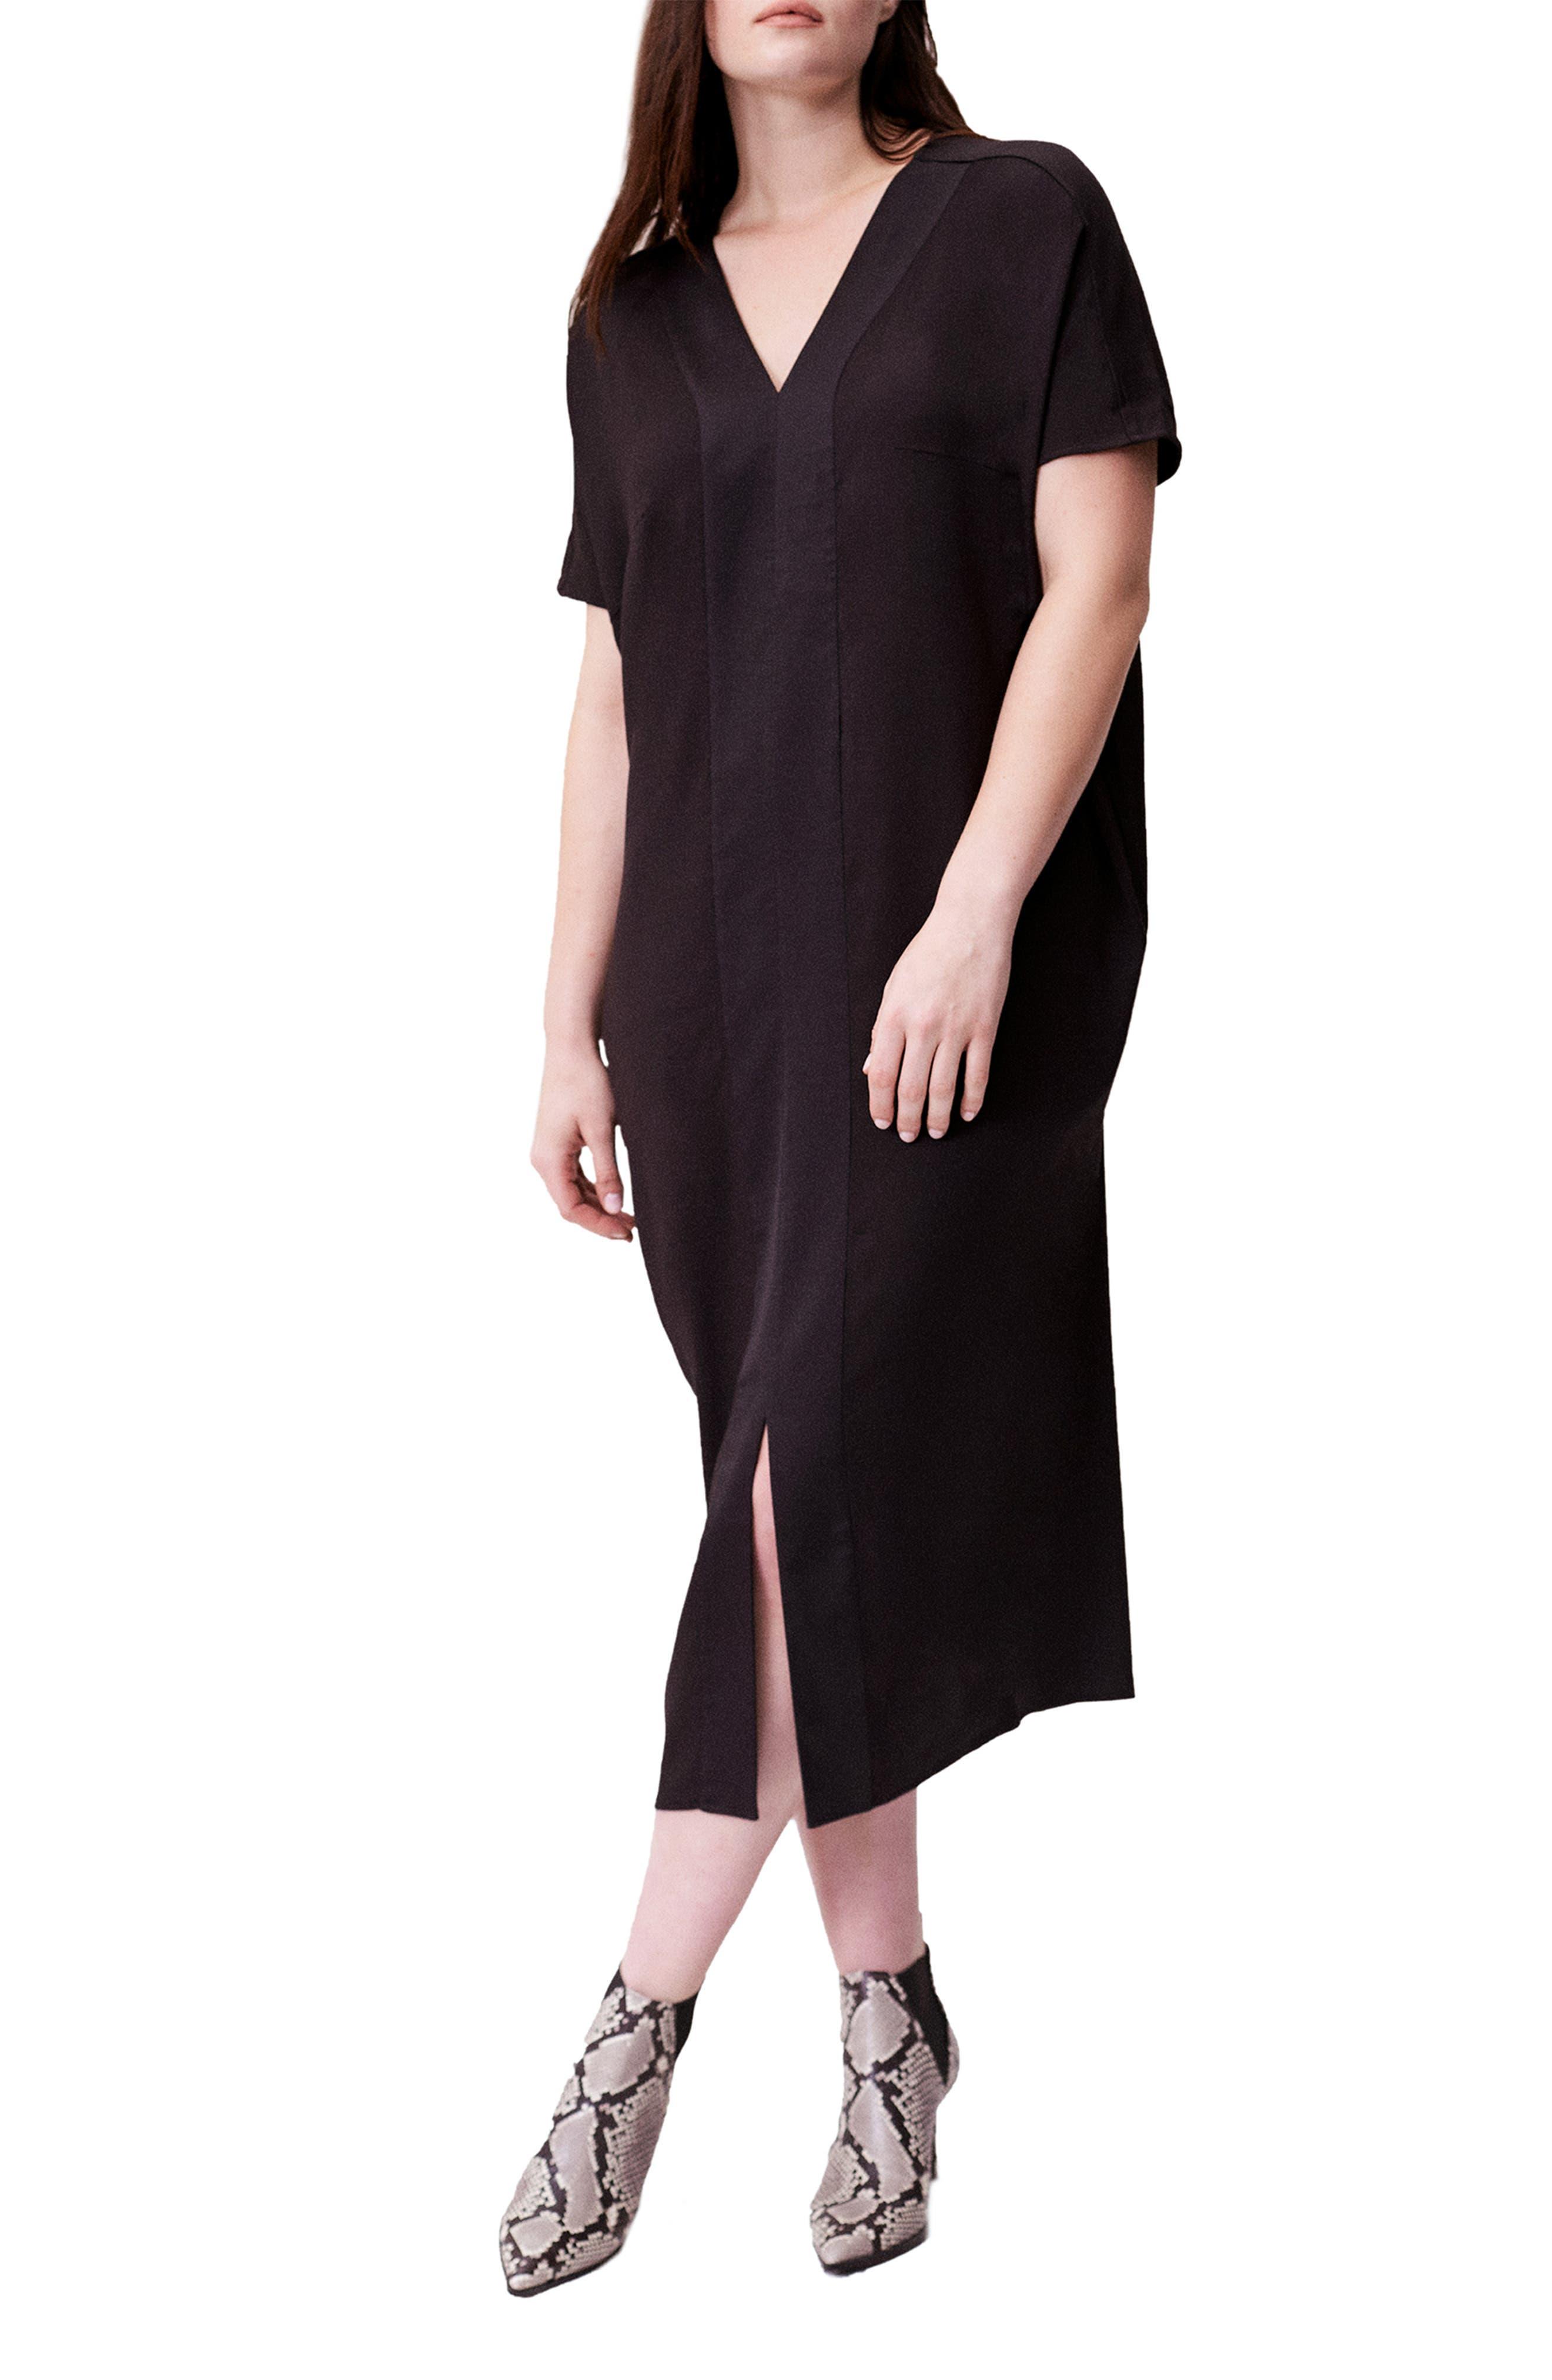 UNIVERSAL STANDARD, Crosby Caftan Dress, Alternate thumbnail 4, color, BLACK